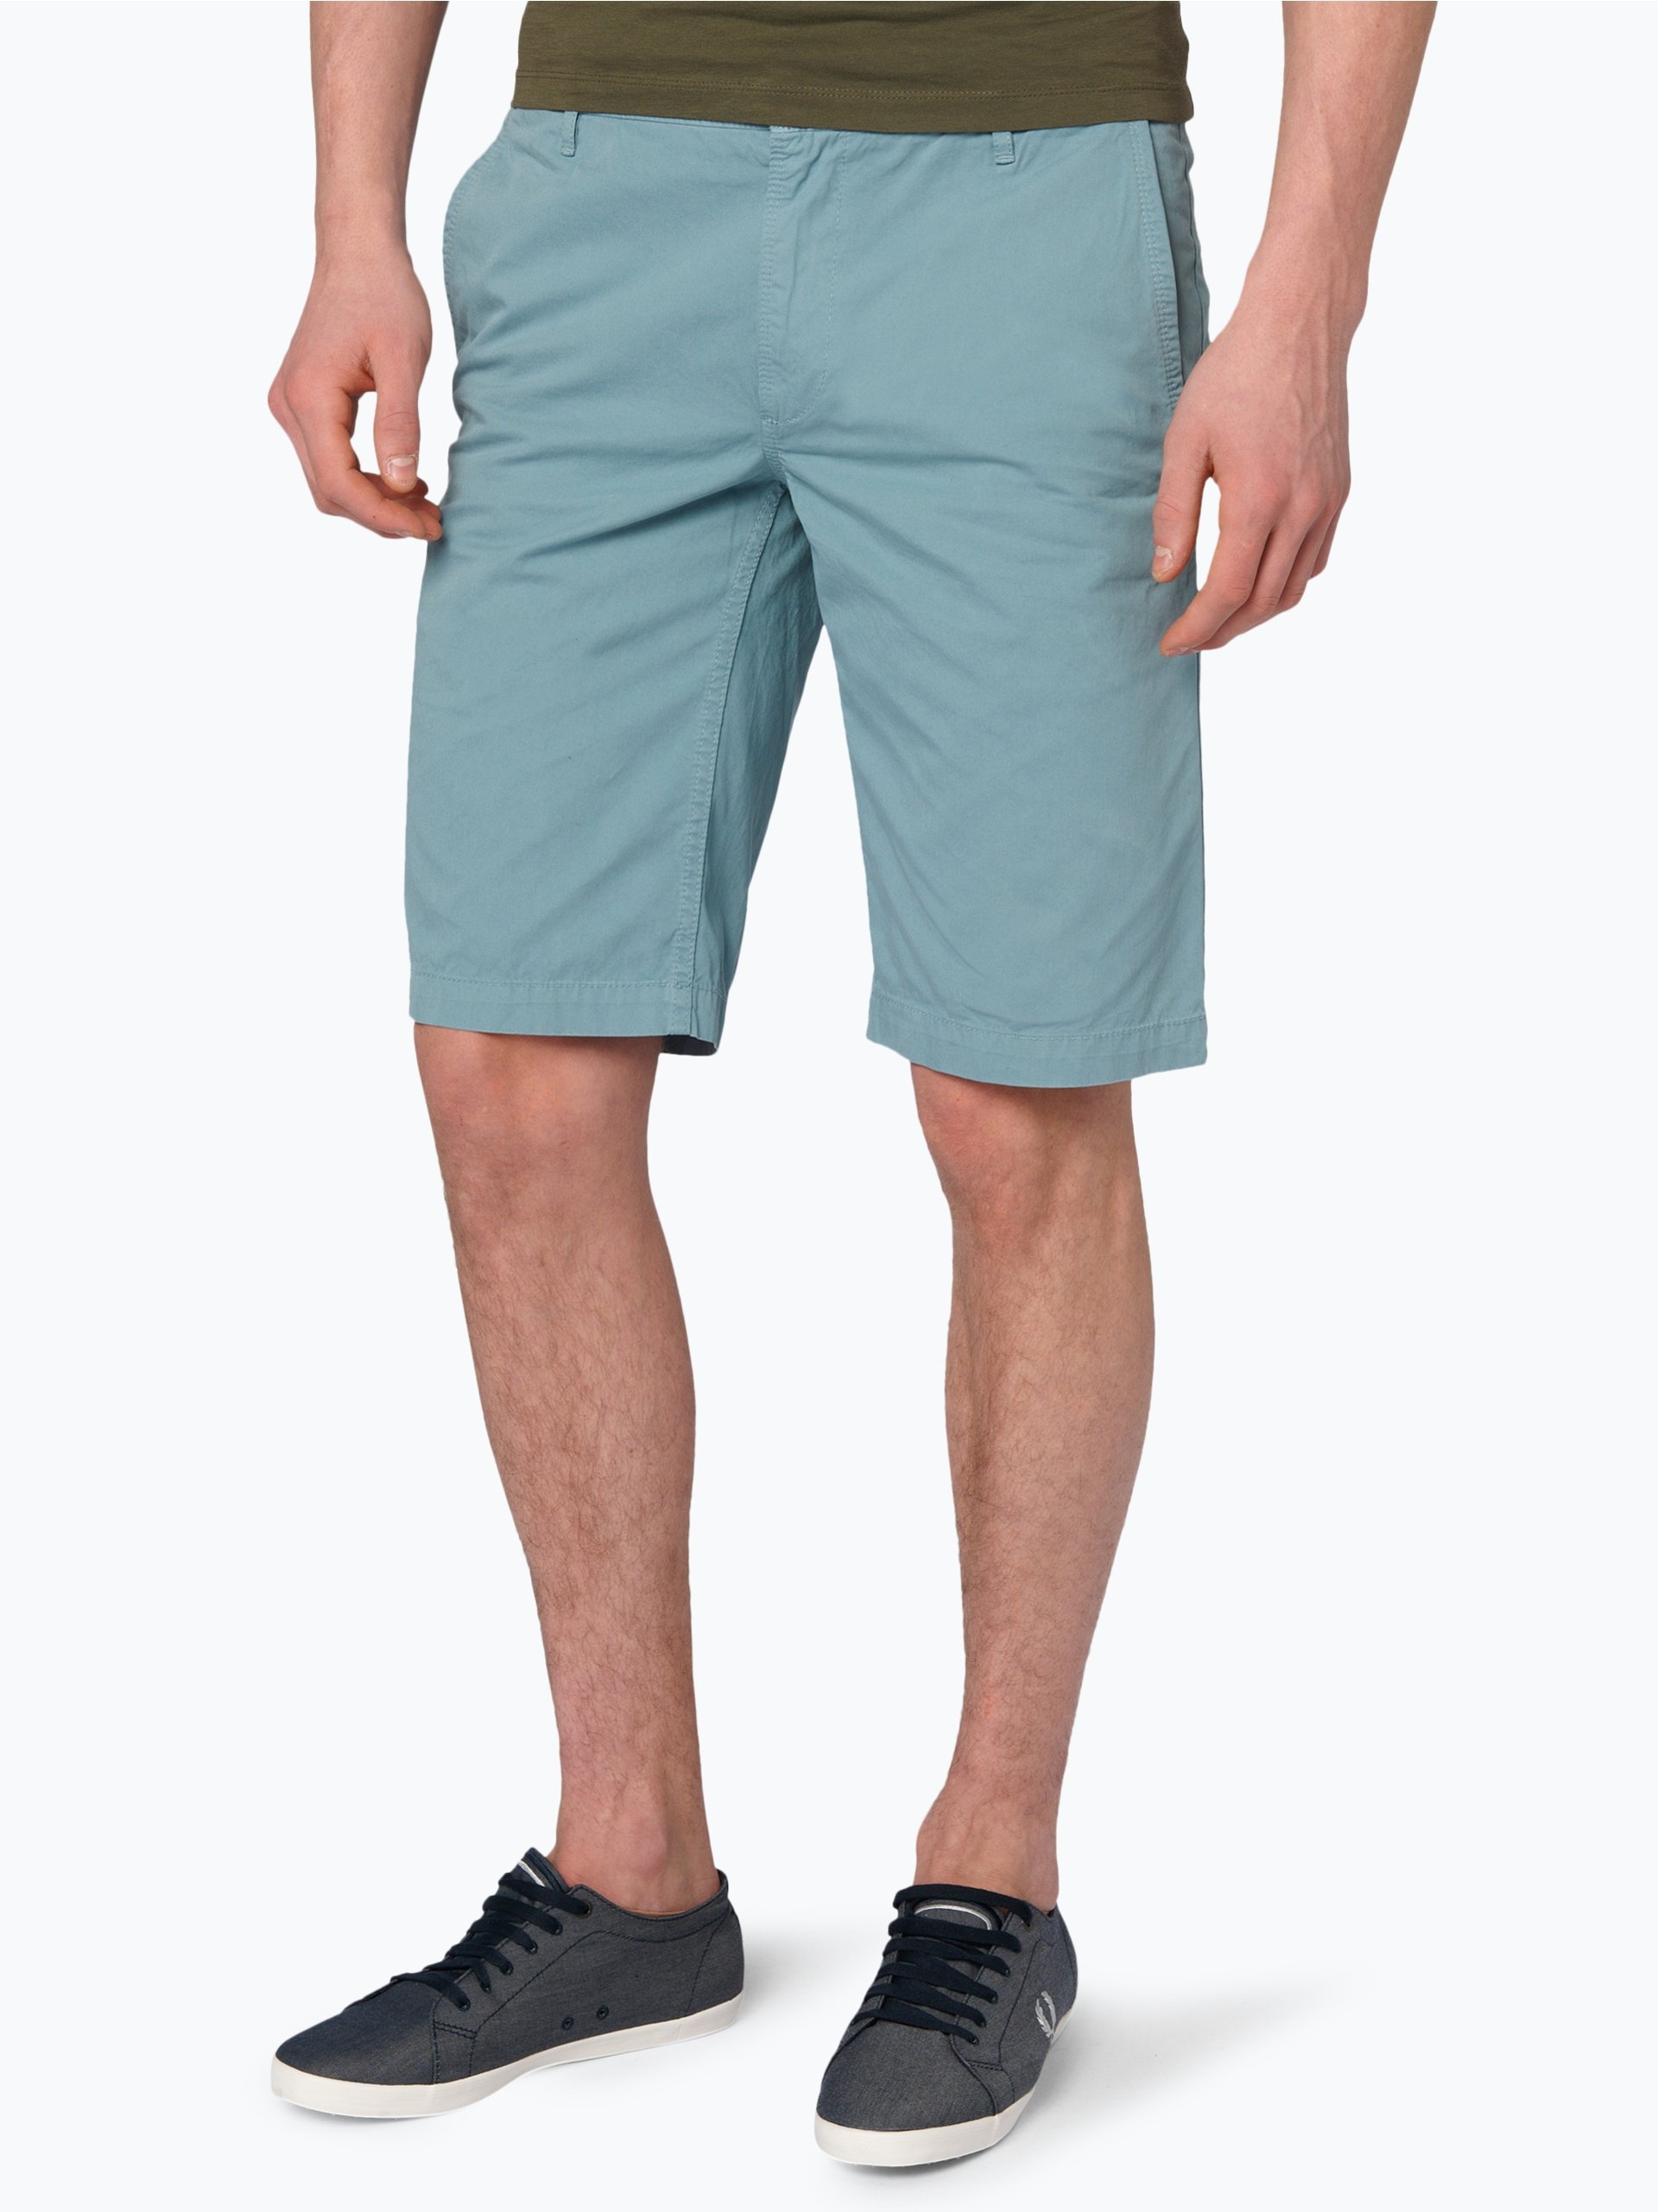 BOSS Casual Herren Shorts - Schino-Shorts